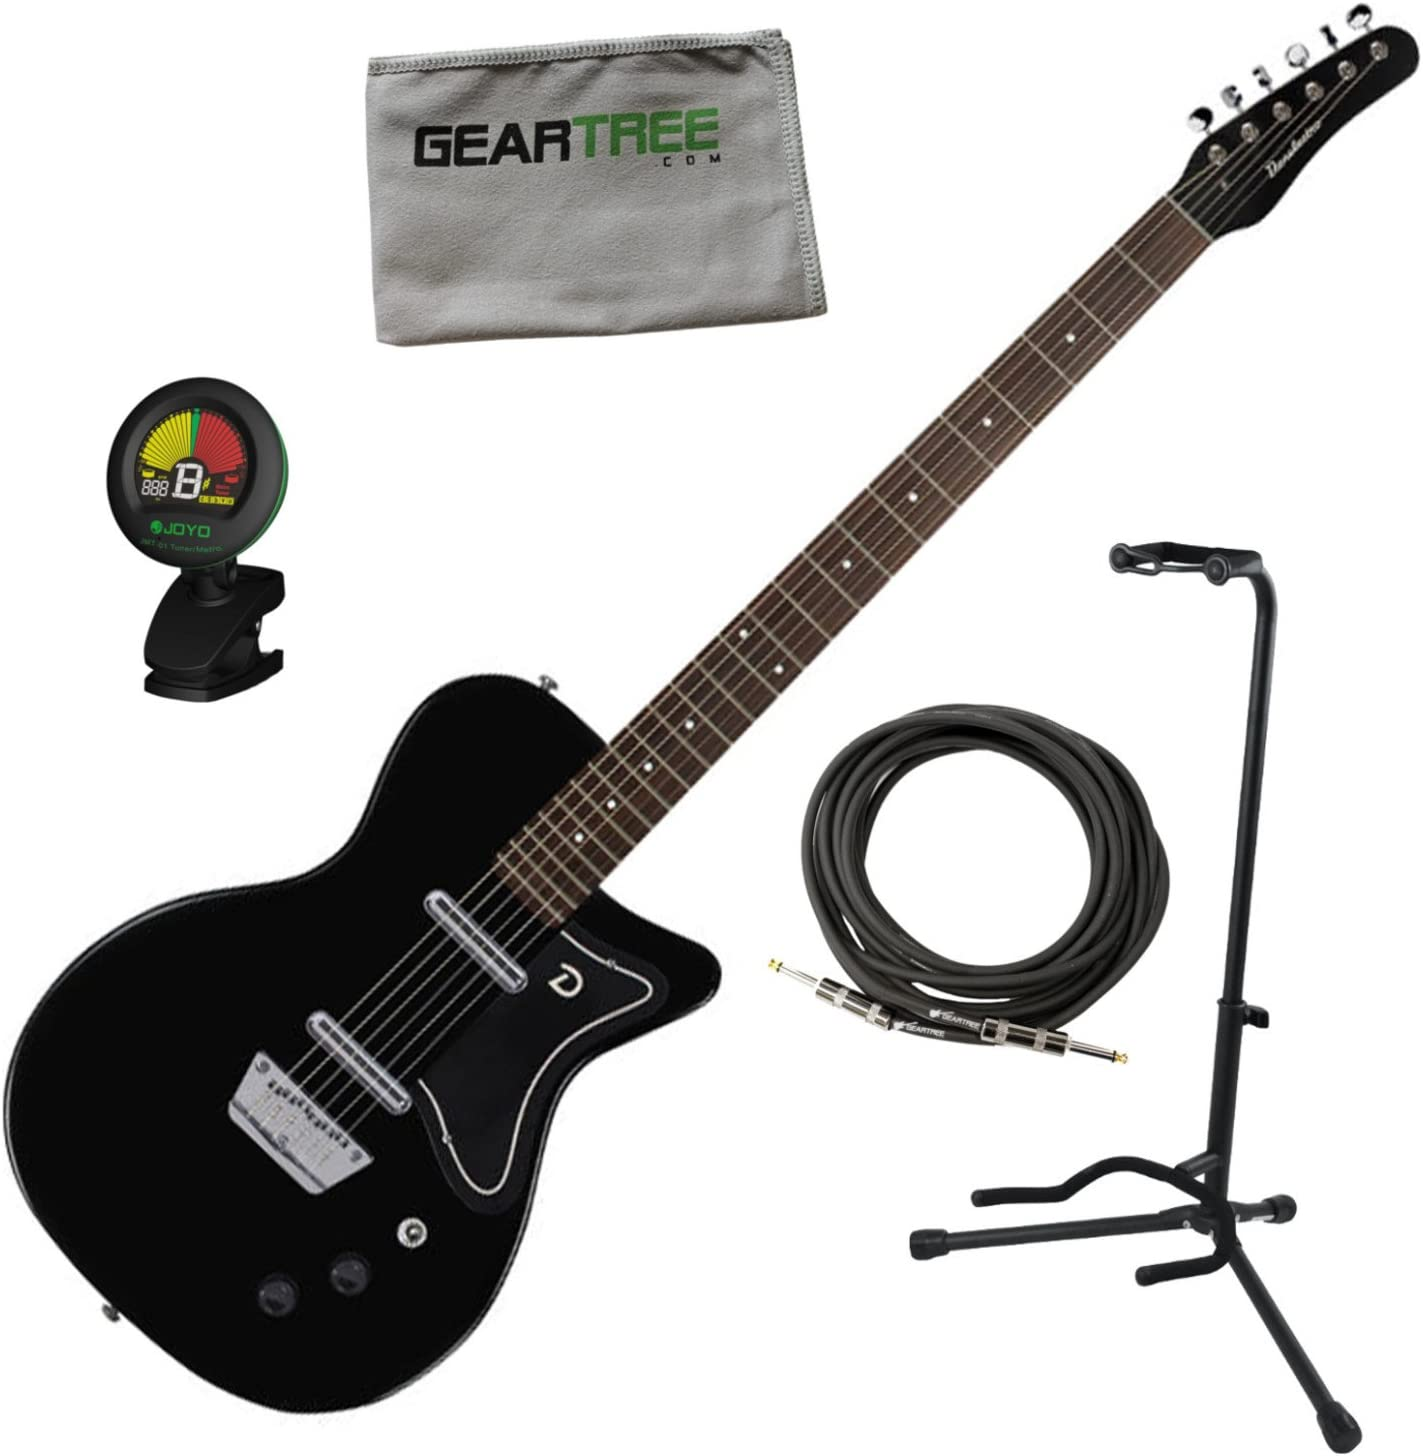 Danelectro 56 barítono guitarra eléctrica Negro w/soporte, Red ...